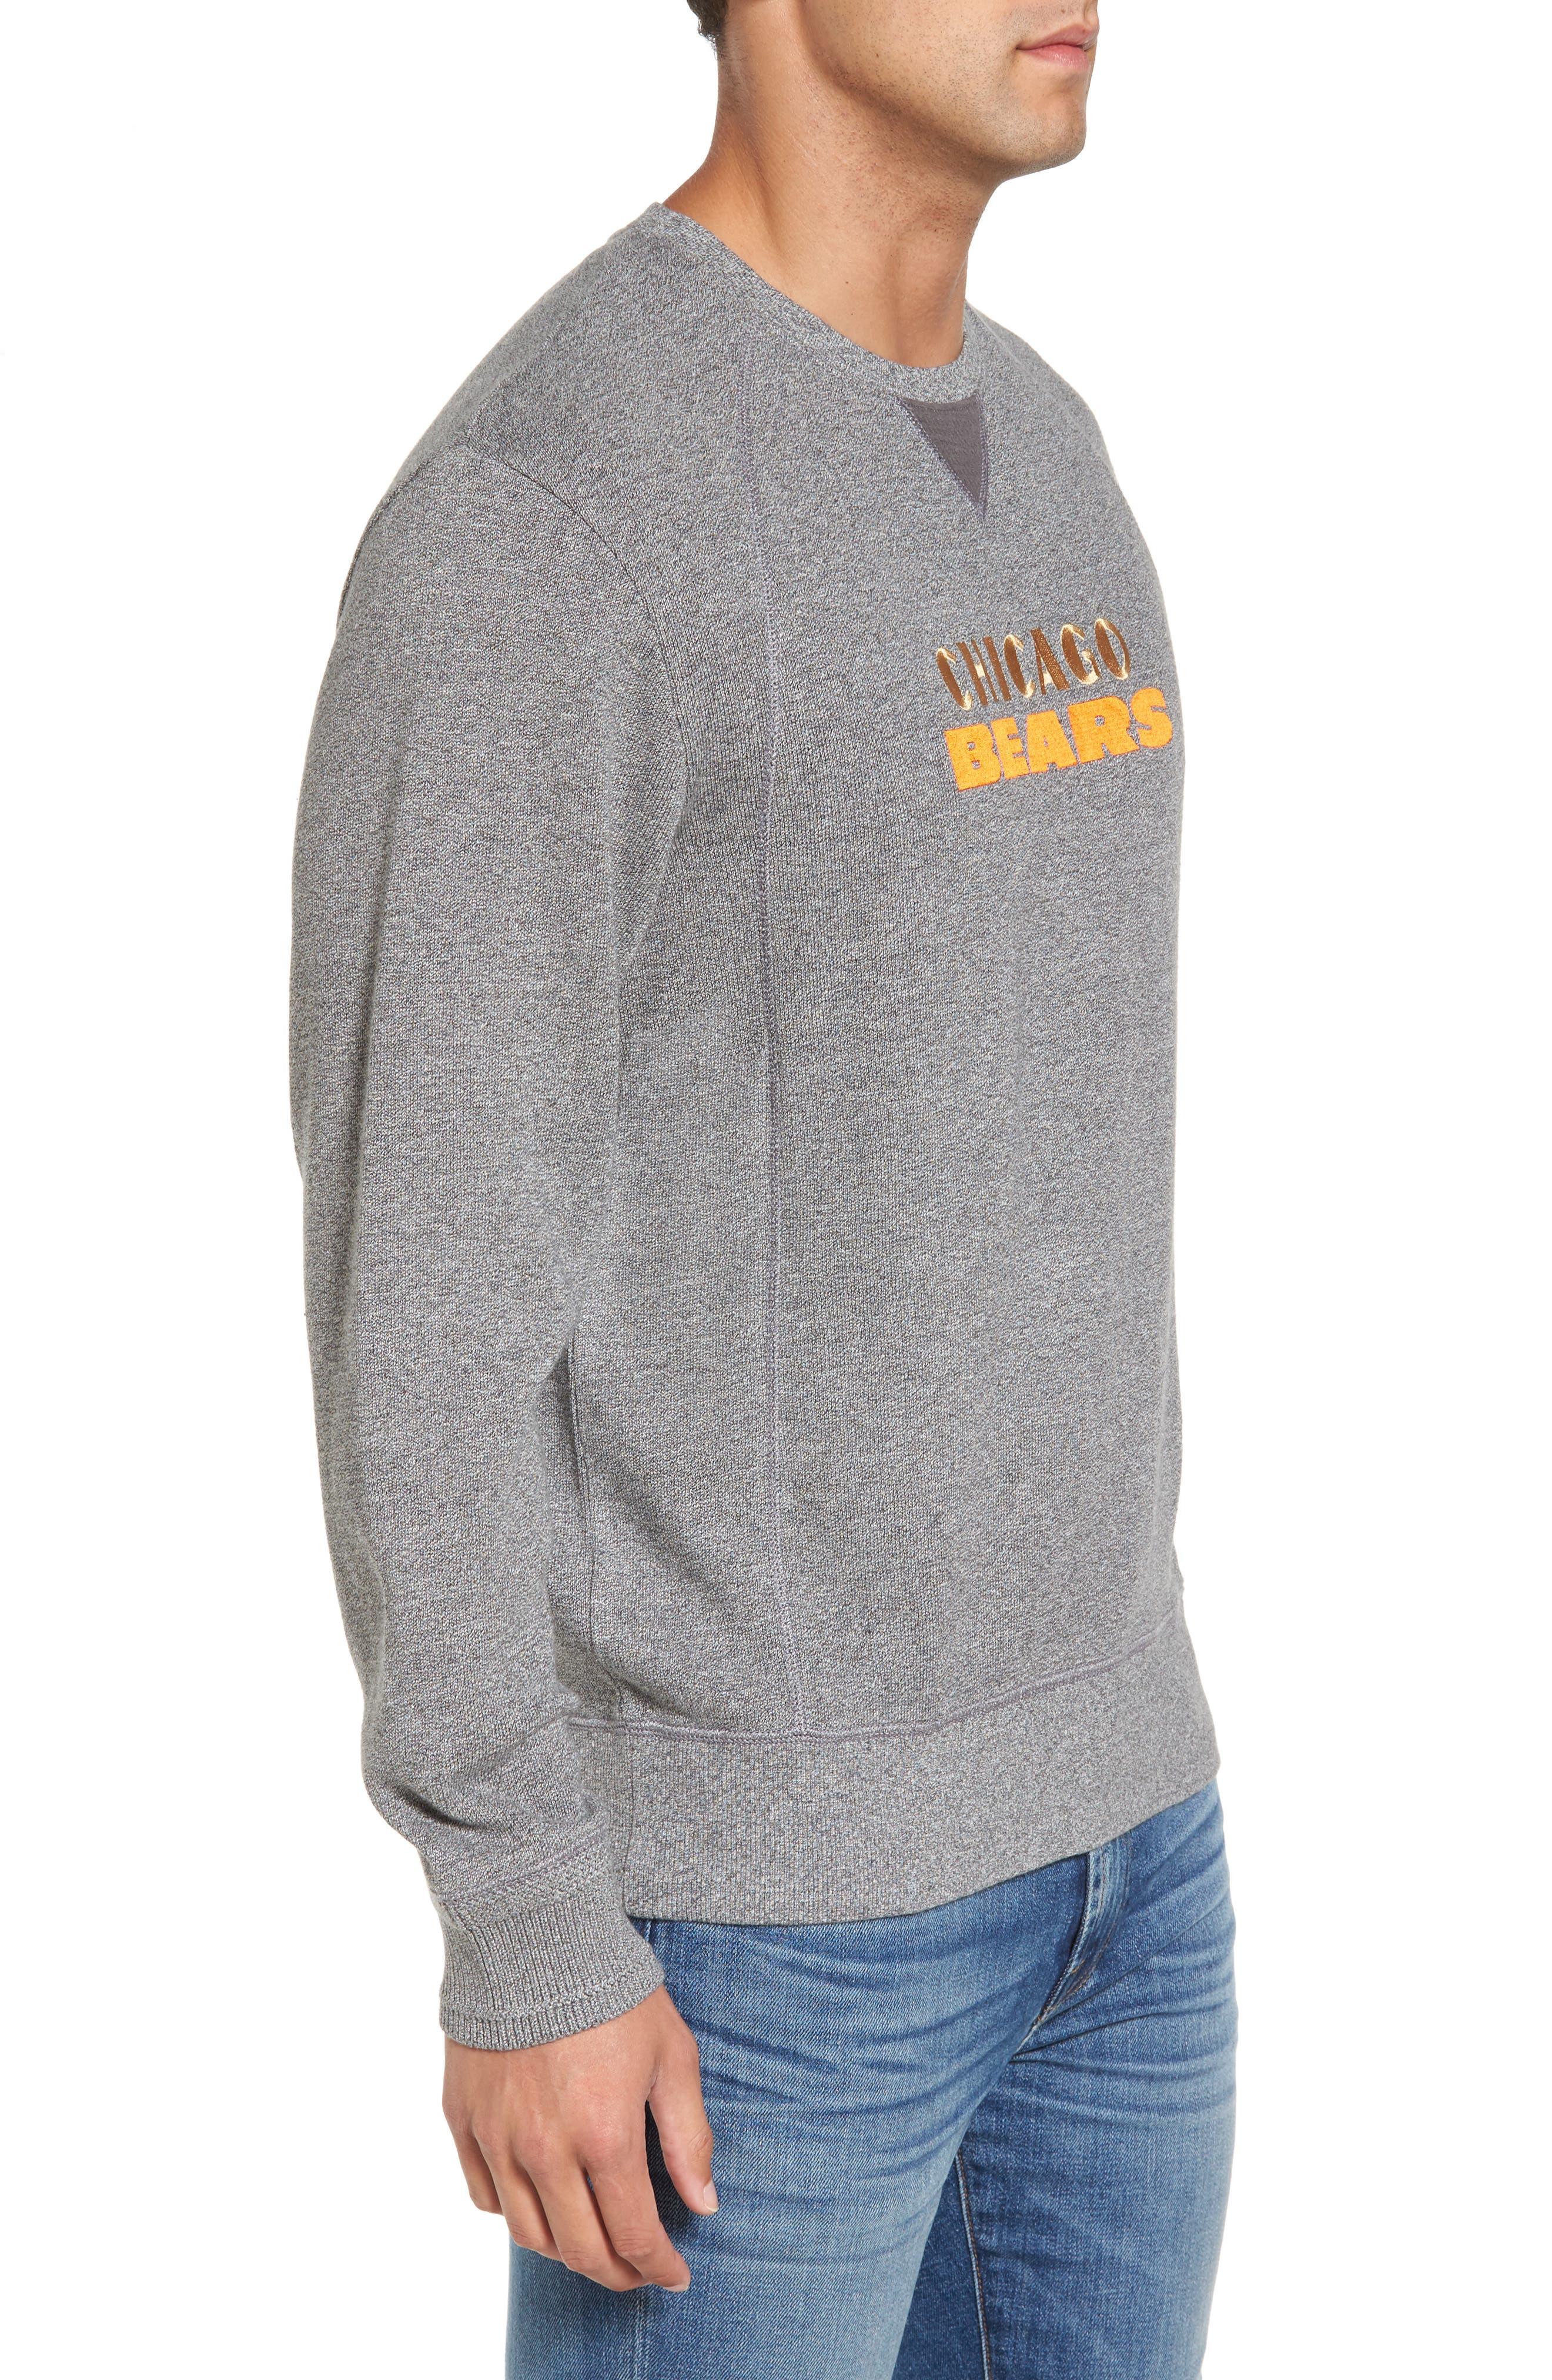 NFL Stitch of Liberty Embroidered Crewneck Sweatshirt,                             Alternate thumbnail 65, color,